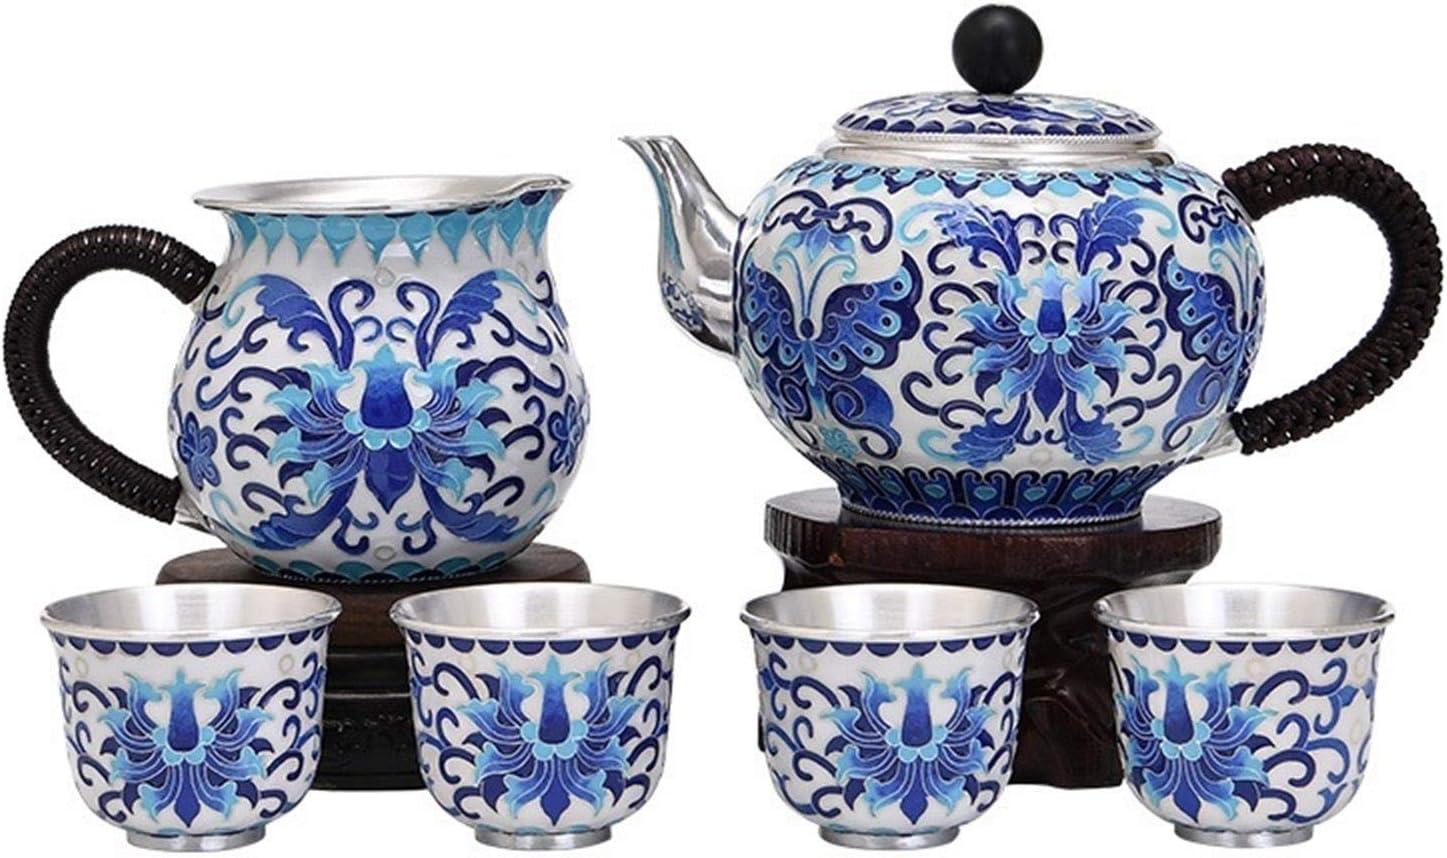 5 popular Max 84% OFF Silver Tea Set Antique Kung Fu Kett Teapot Metal Old Chinese